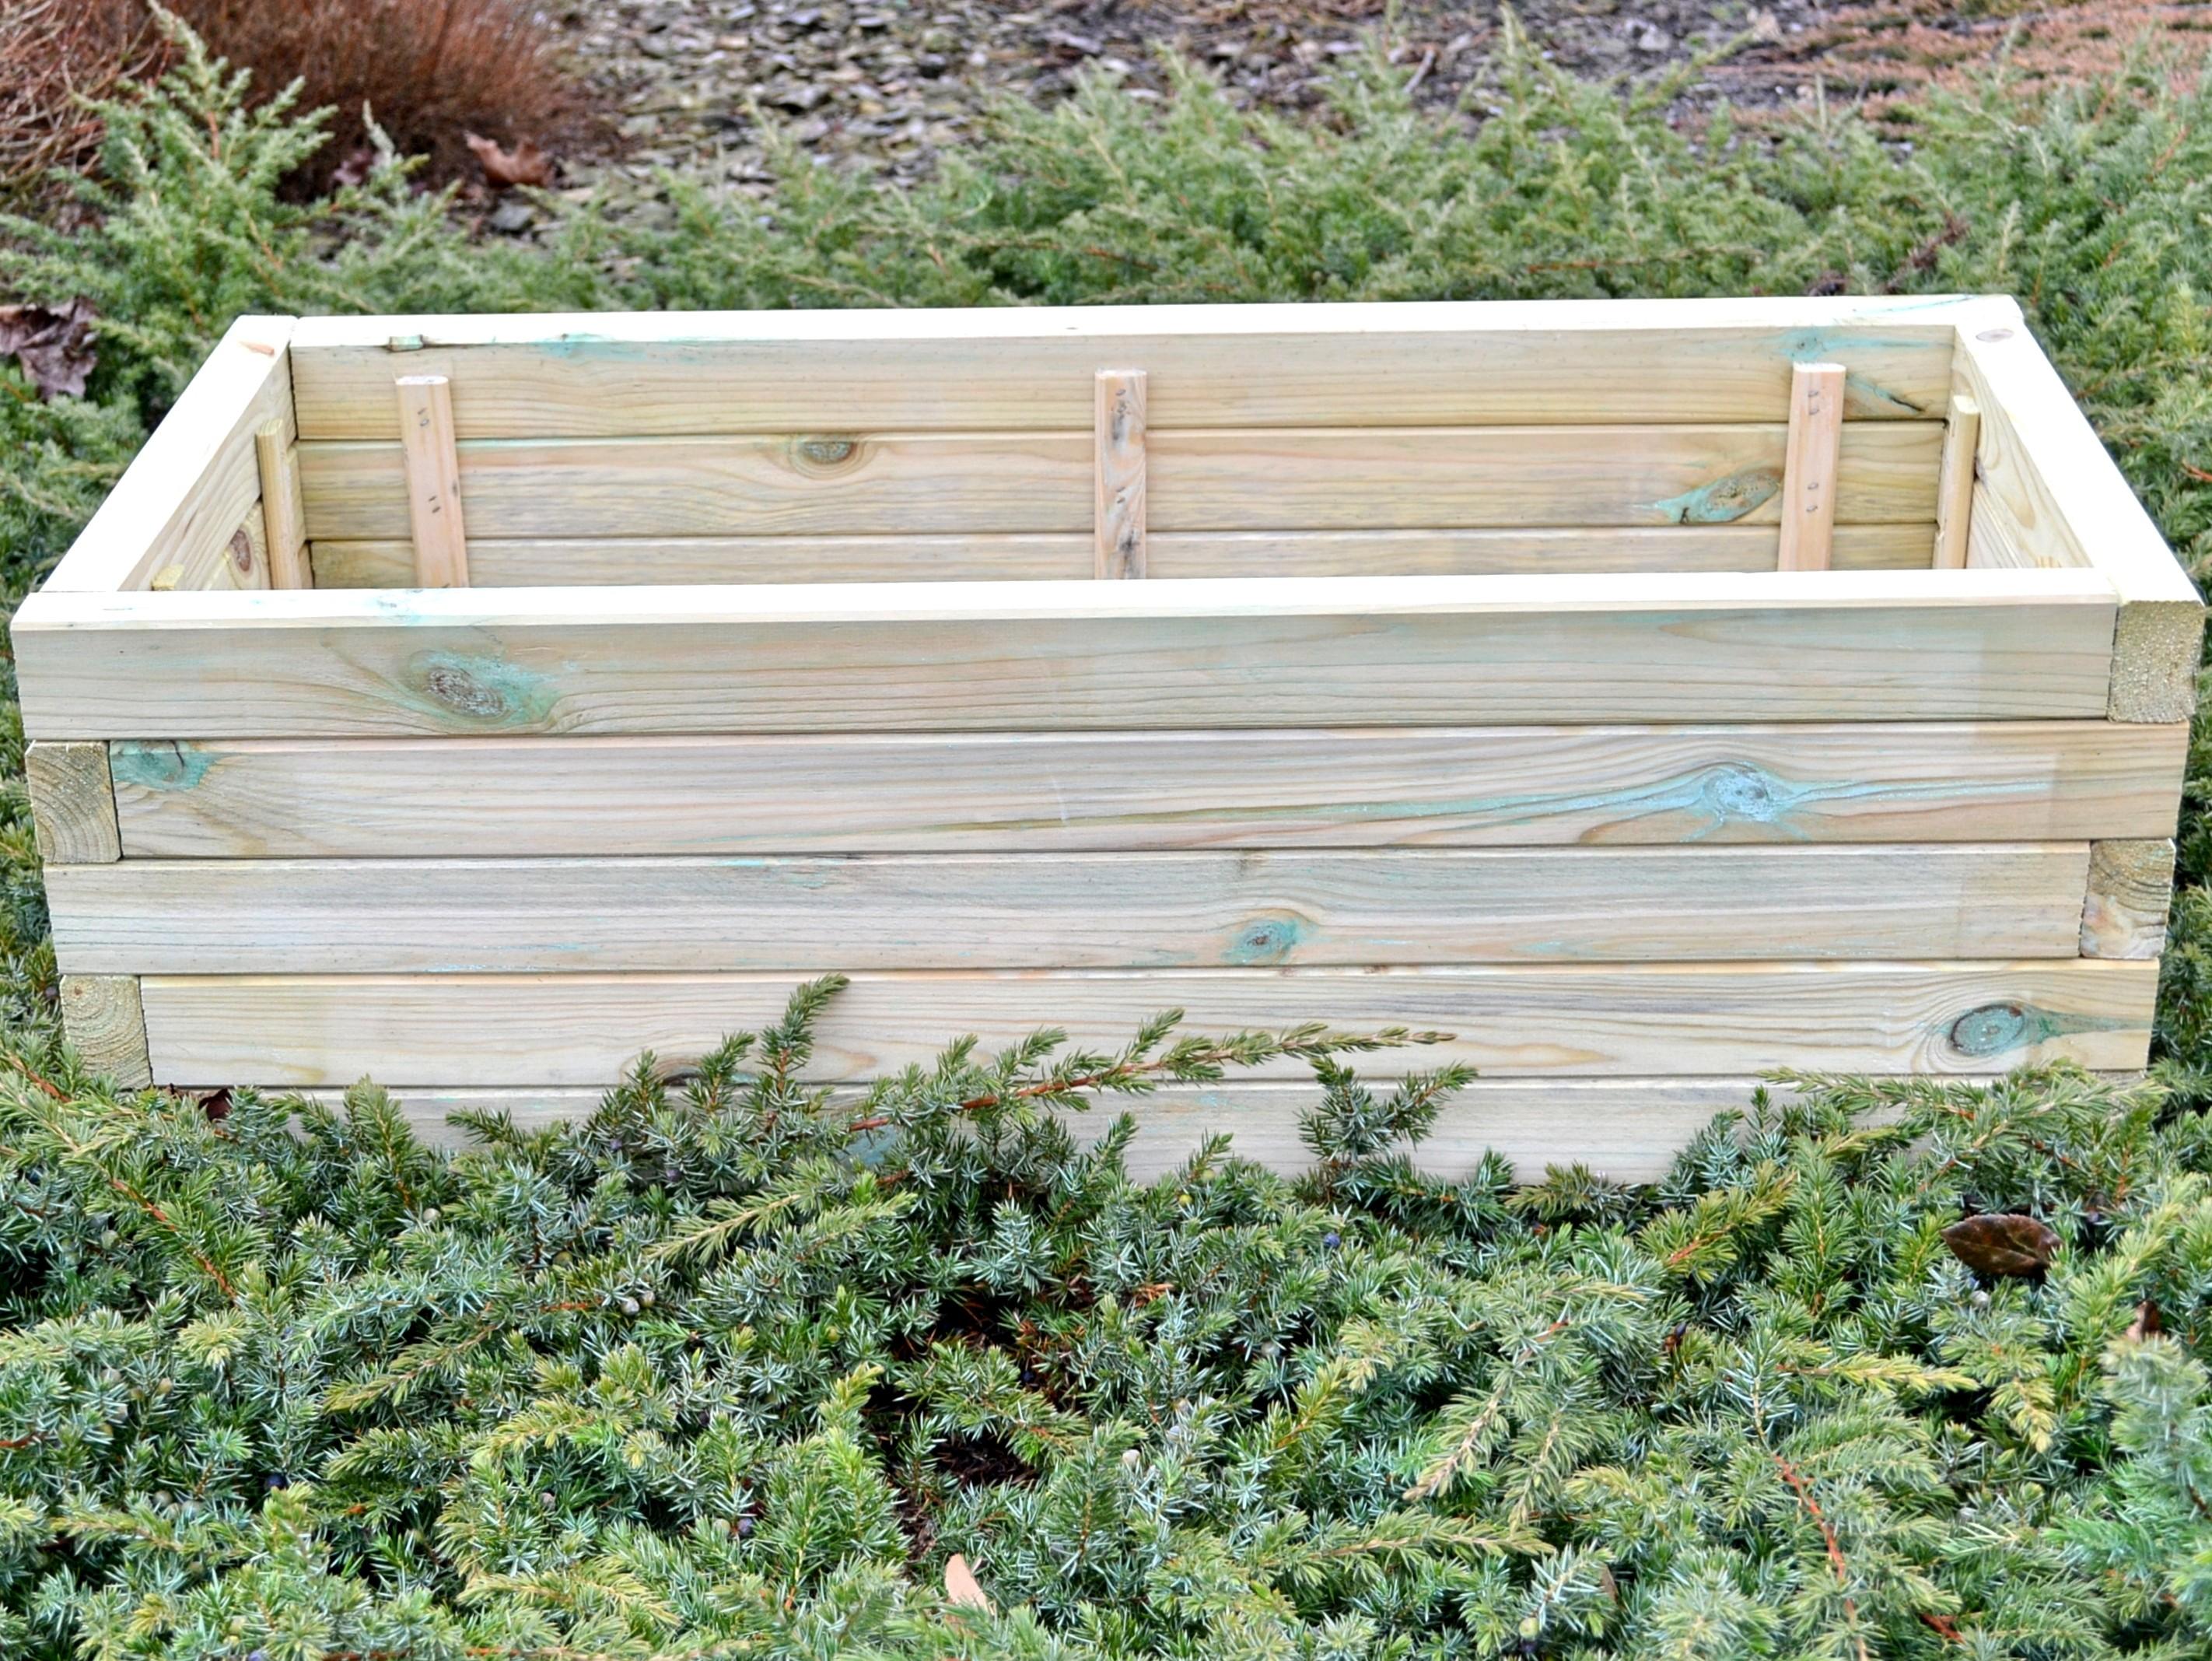 Pflanzkasten aus Holz Pflanzkübel Grün D22 90x40x29 cm Kübel ...